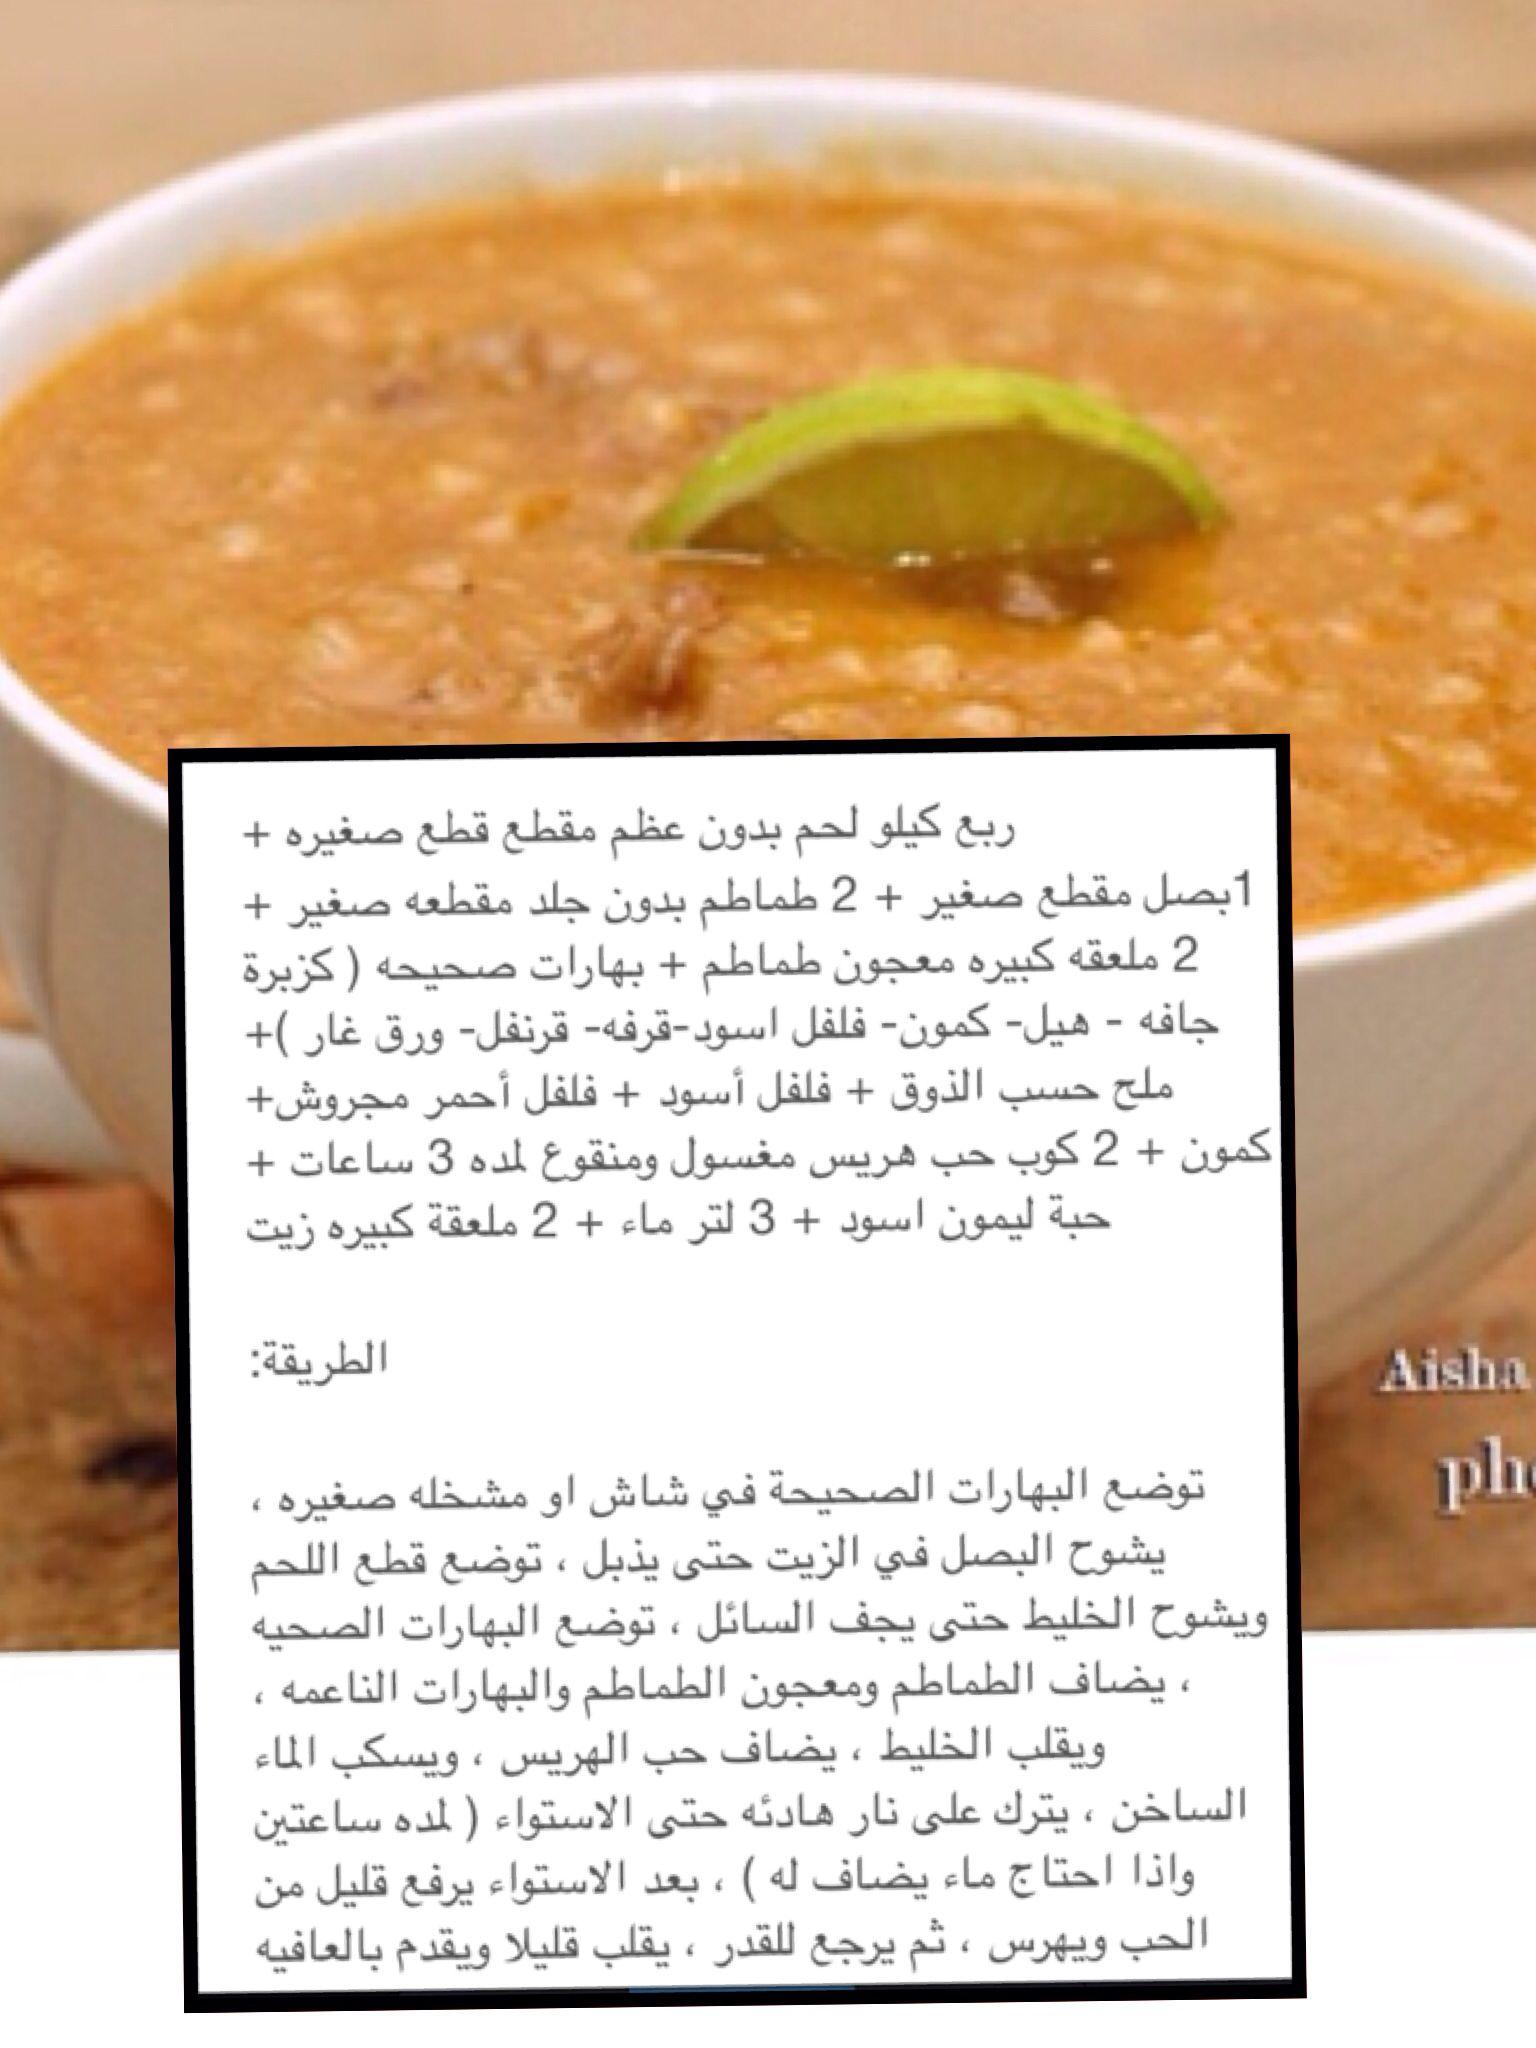 شوربة هريس Cookout Food Recipes Food Receipes